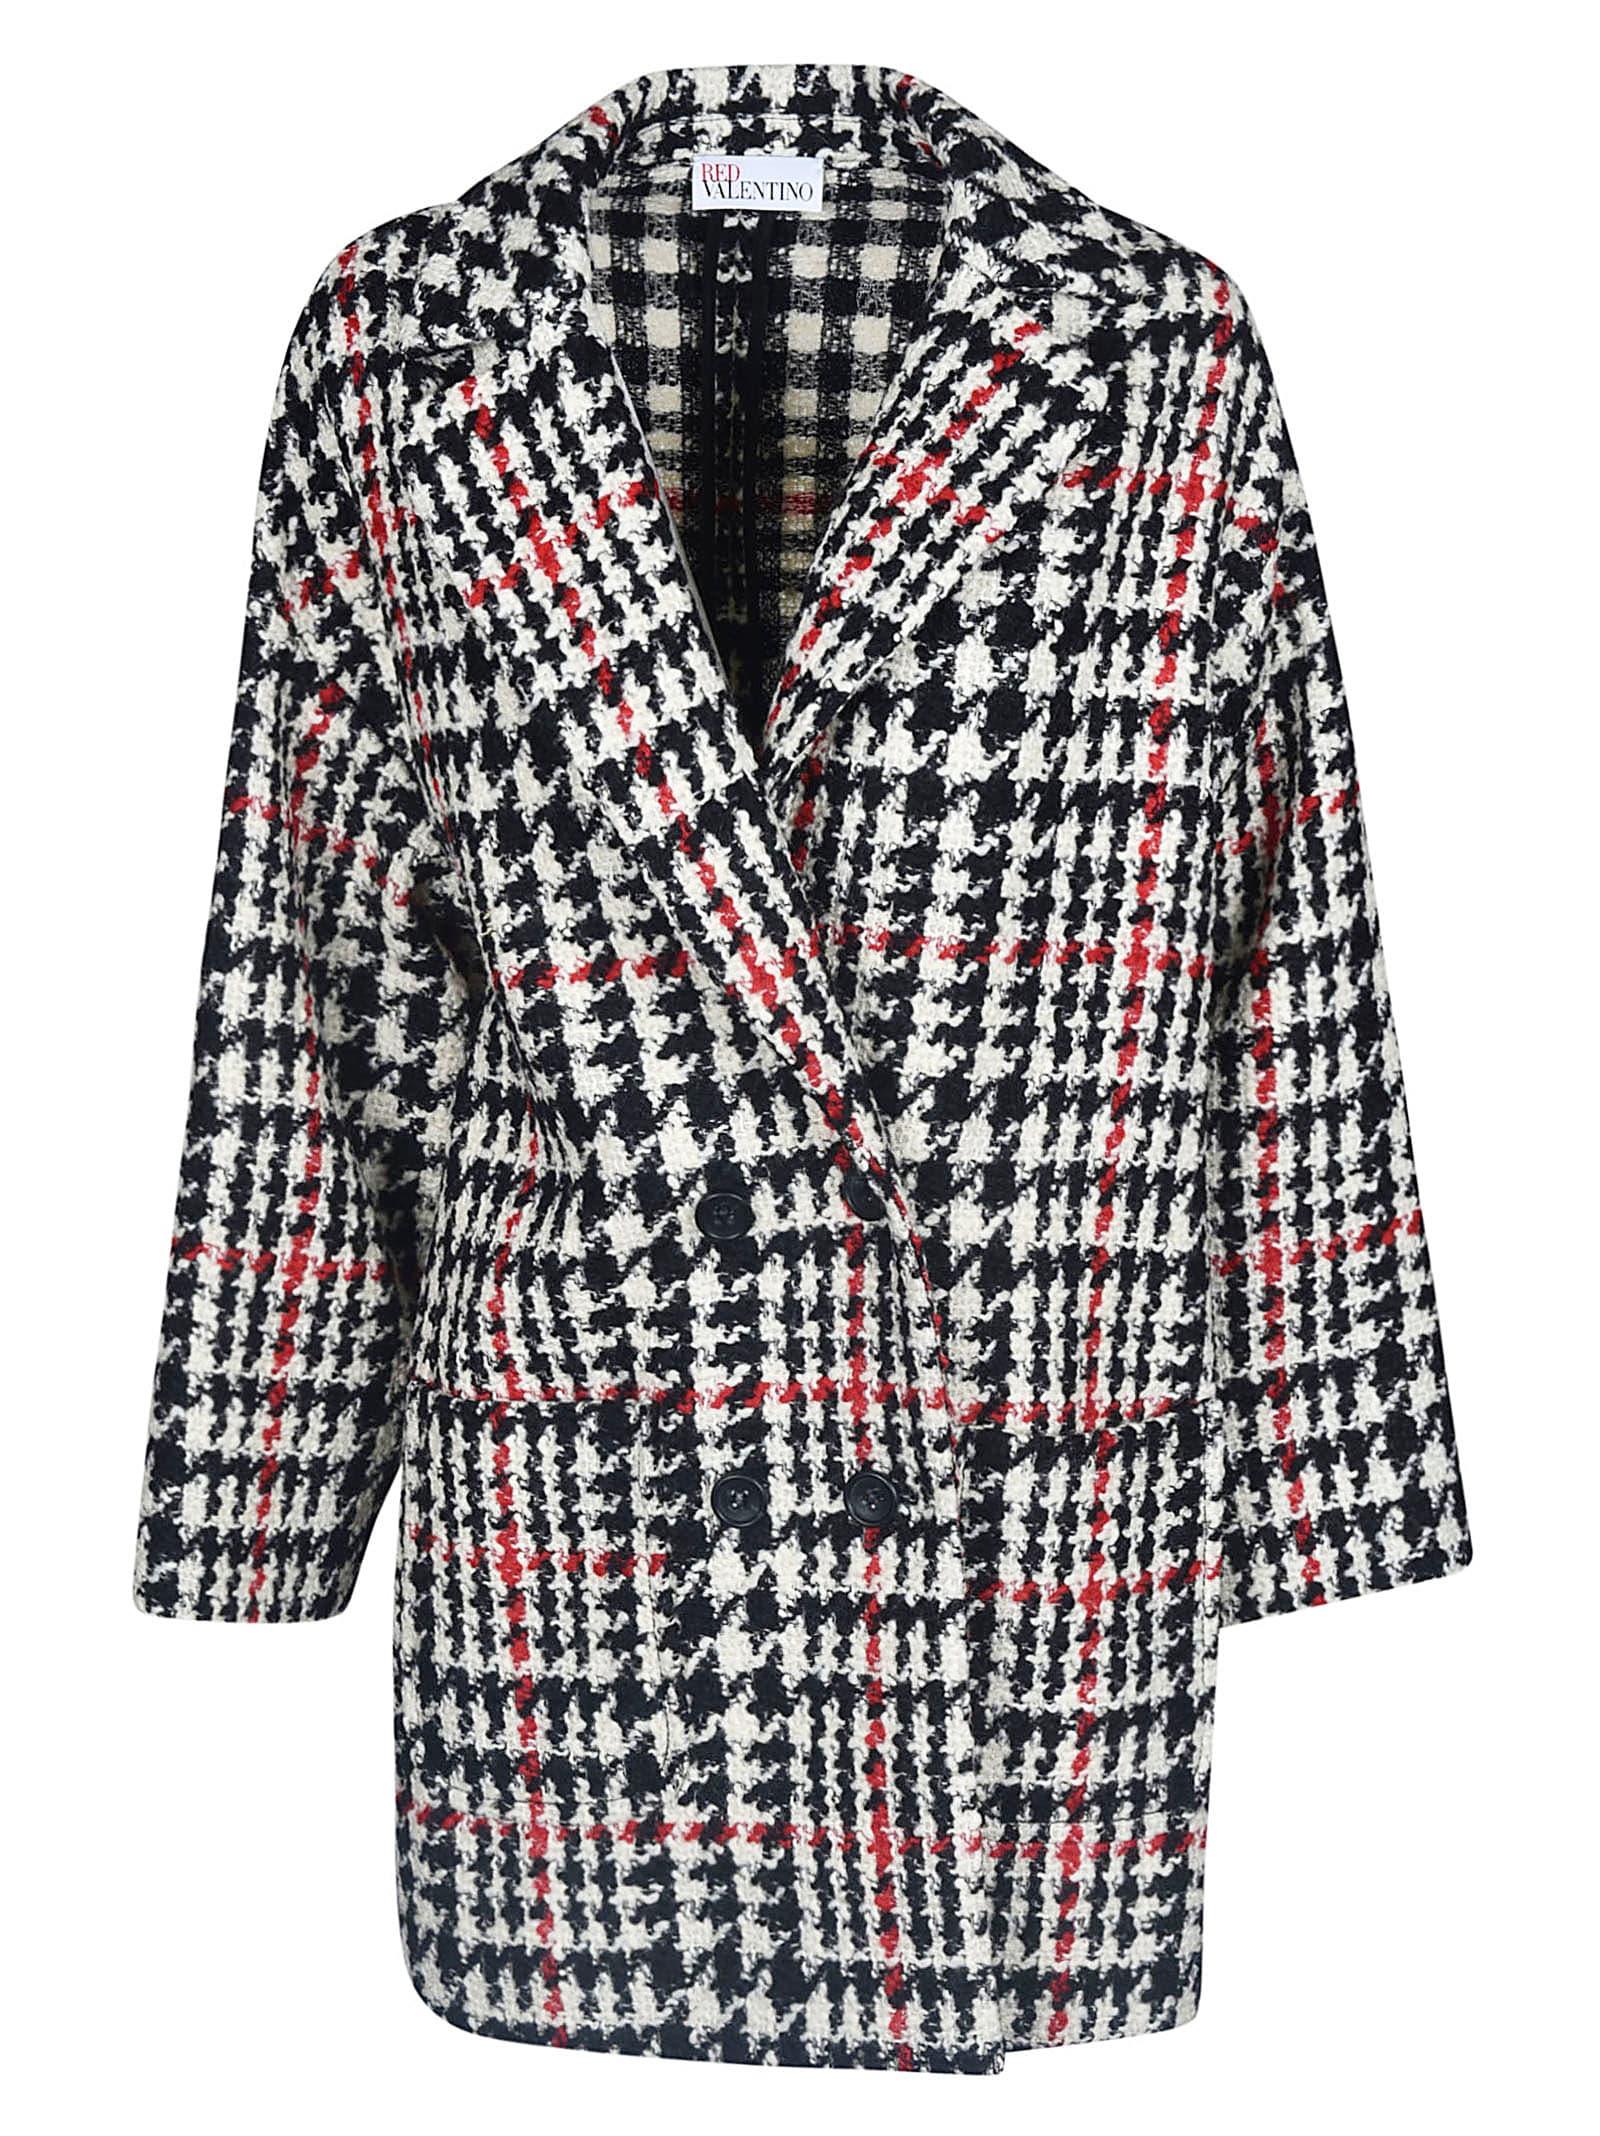 Valentino Houndstooth Coat